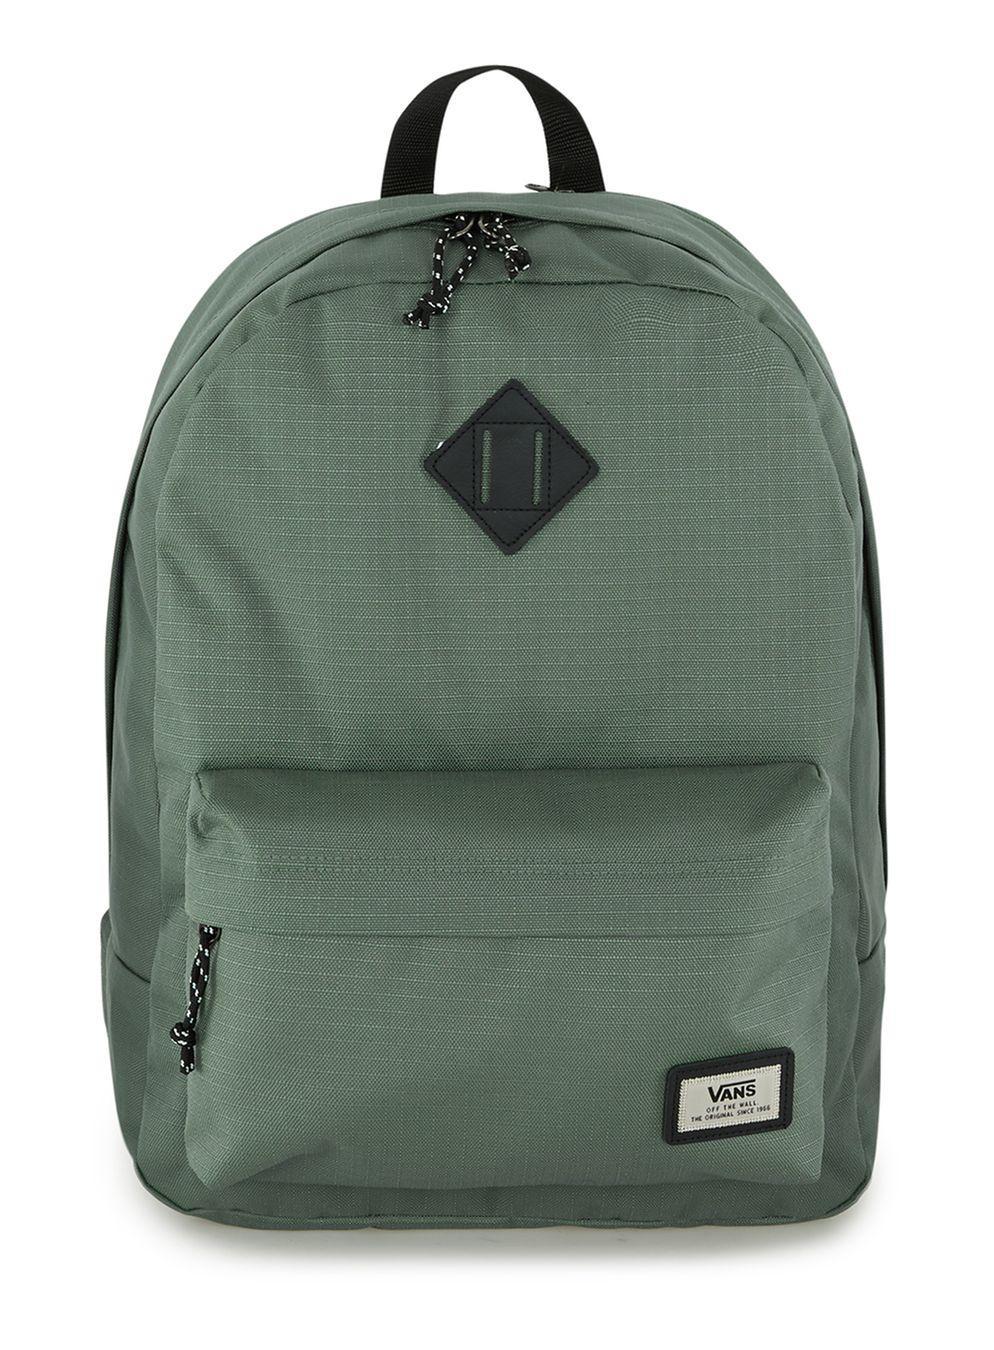 6c4fe33218 Topman Vans Mint Green Old Skool Backpack In For Men Lyst